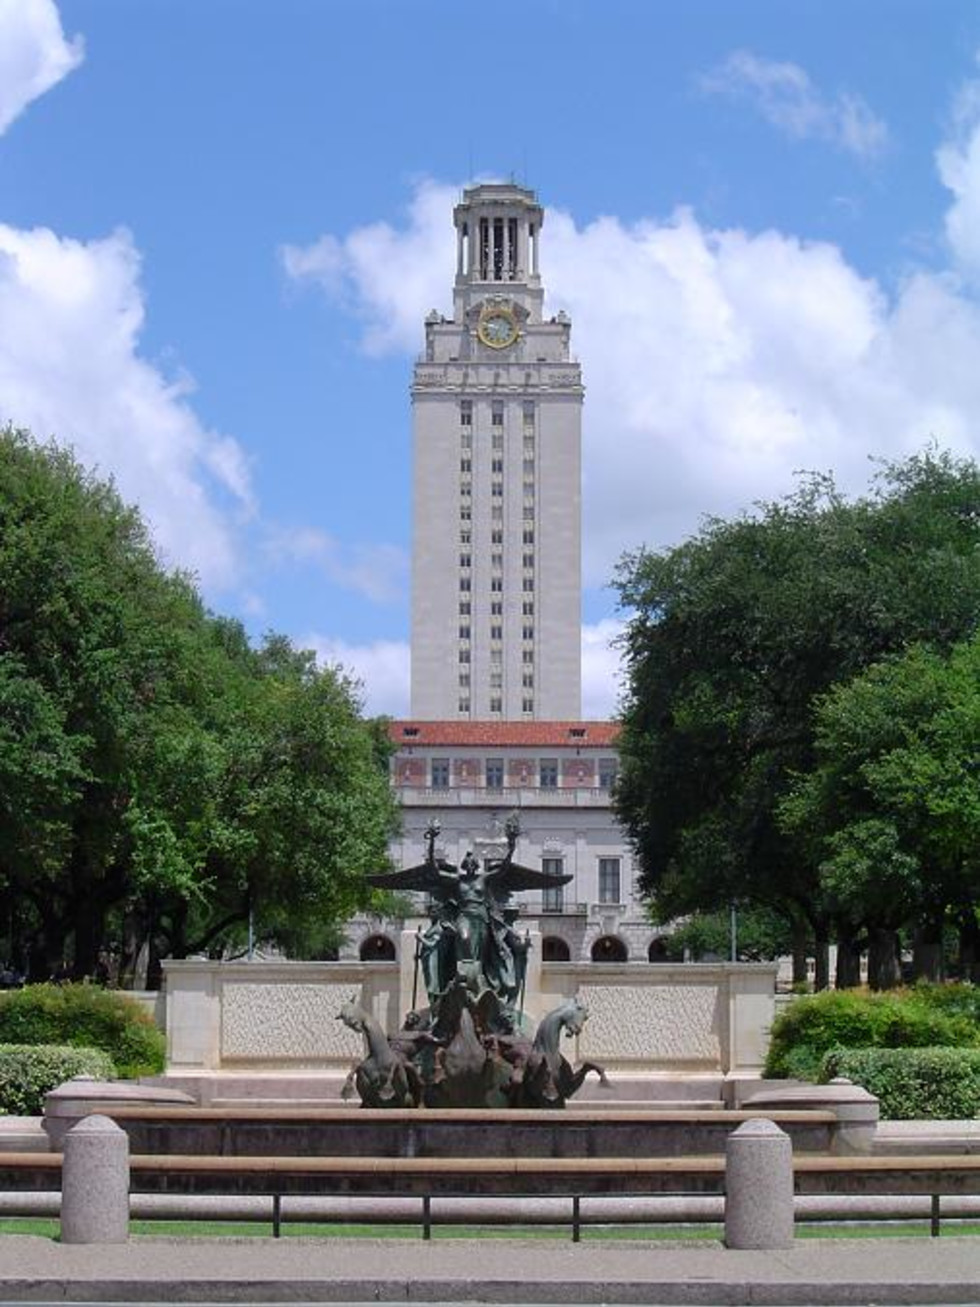 Austin_photo: places_outdoors_ut tower_fountain